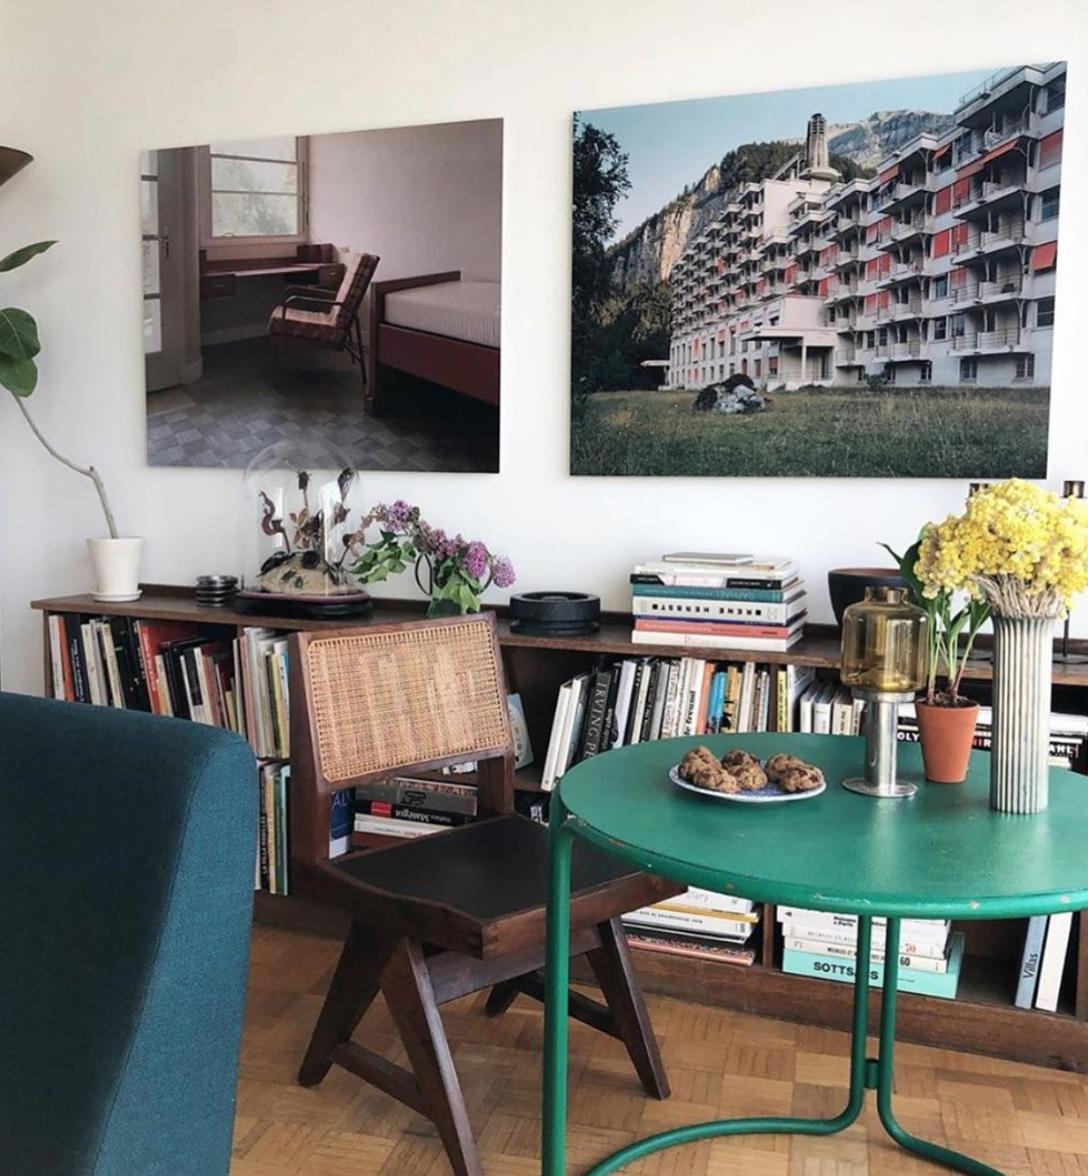 #interiors #interiordesign #design #home #paris #france @olivieramsellem #photographer #photography #prouve #jeanneret #perriand #lecorbusier #midcenturymodern #midcenturyfurniture #frenchmodernism #instadaily #inspiration